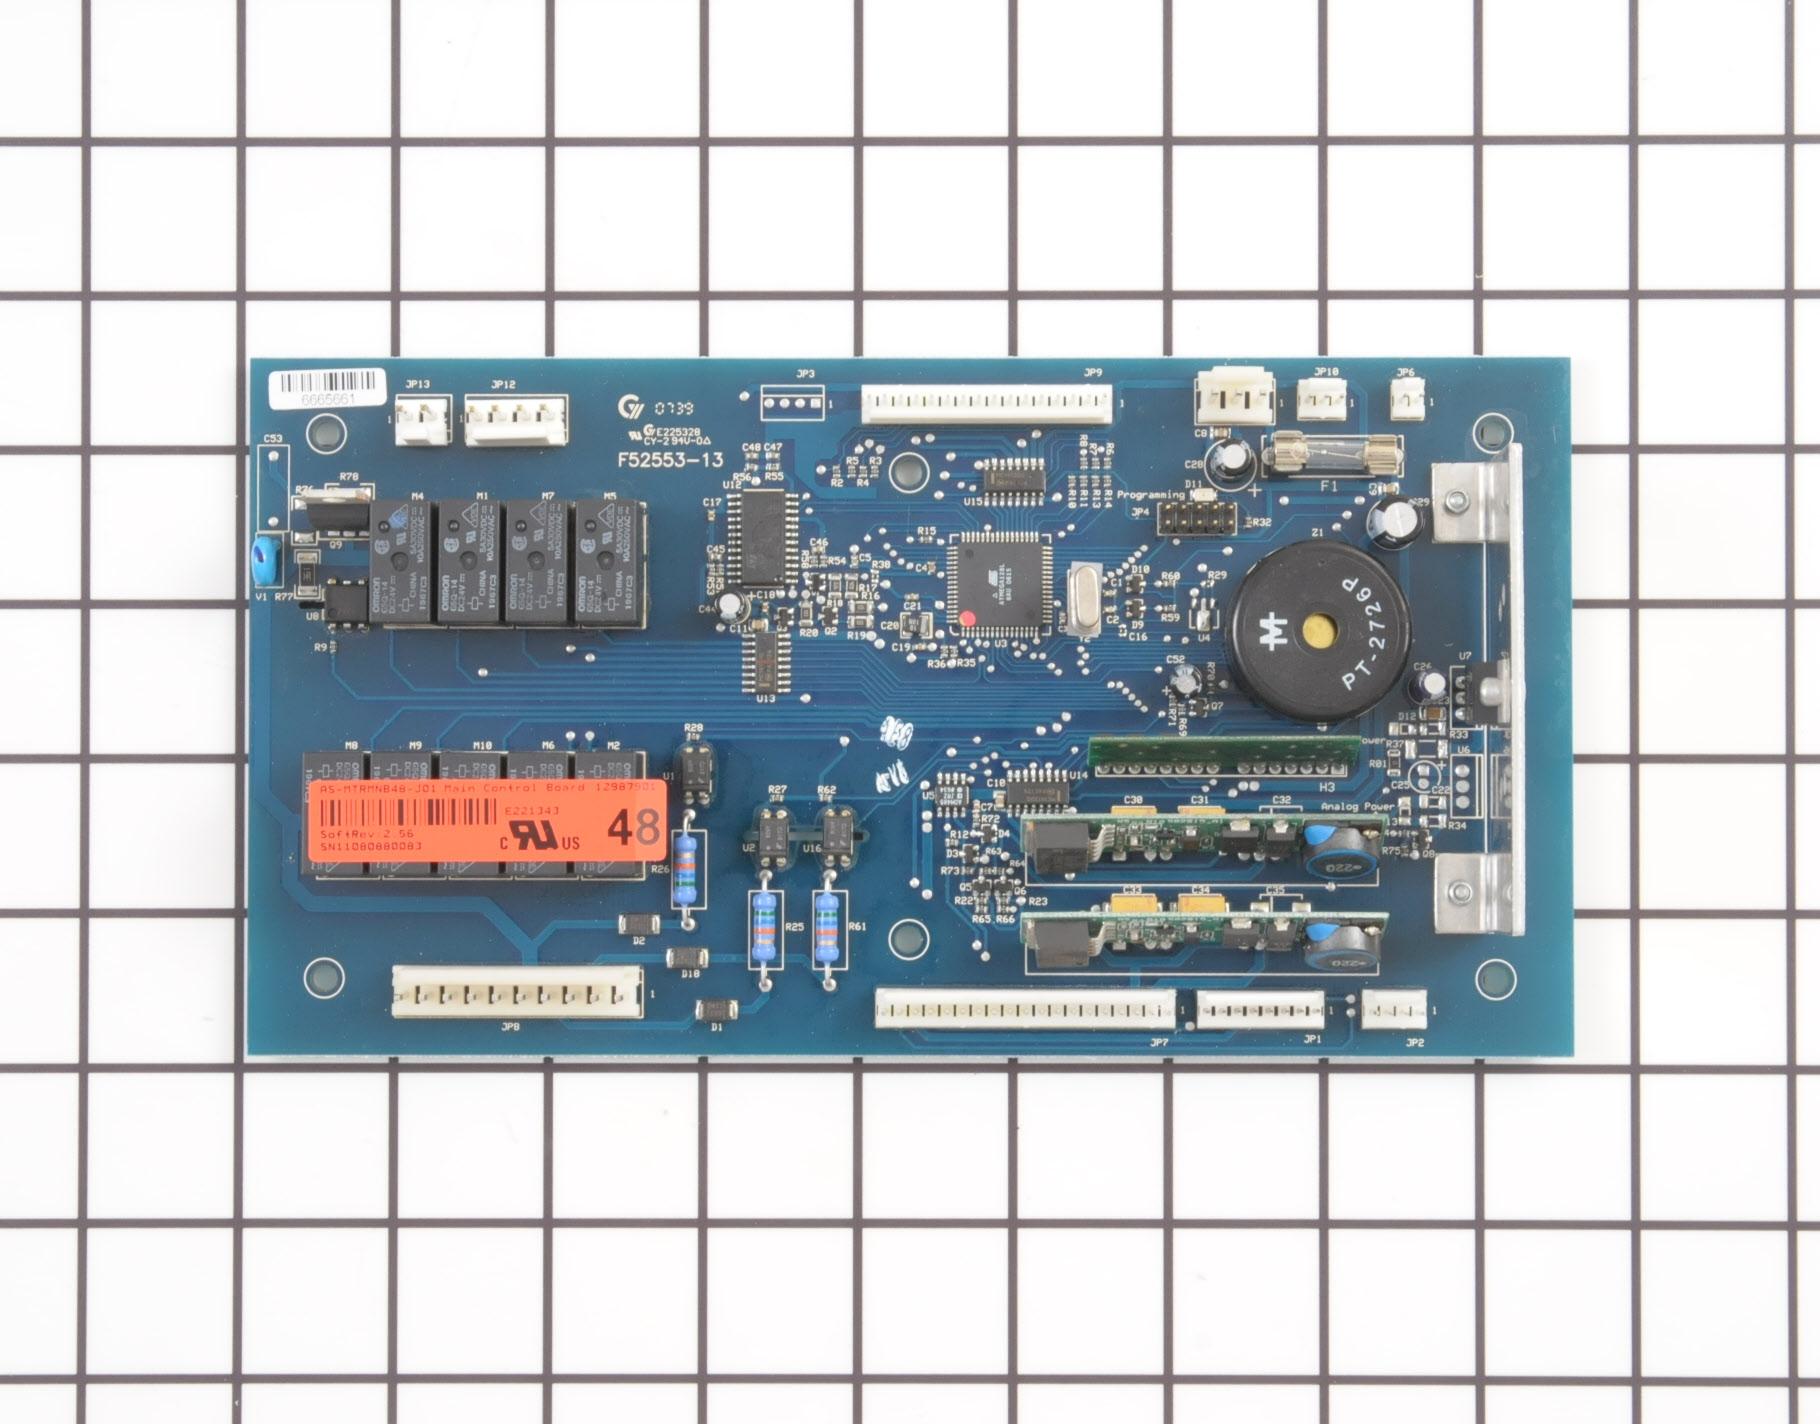 WP67006853 Jenn Air Refrigerator Part -Main Control Board